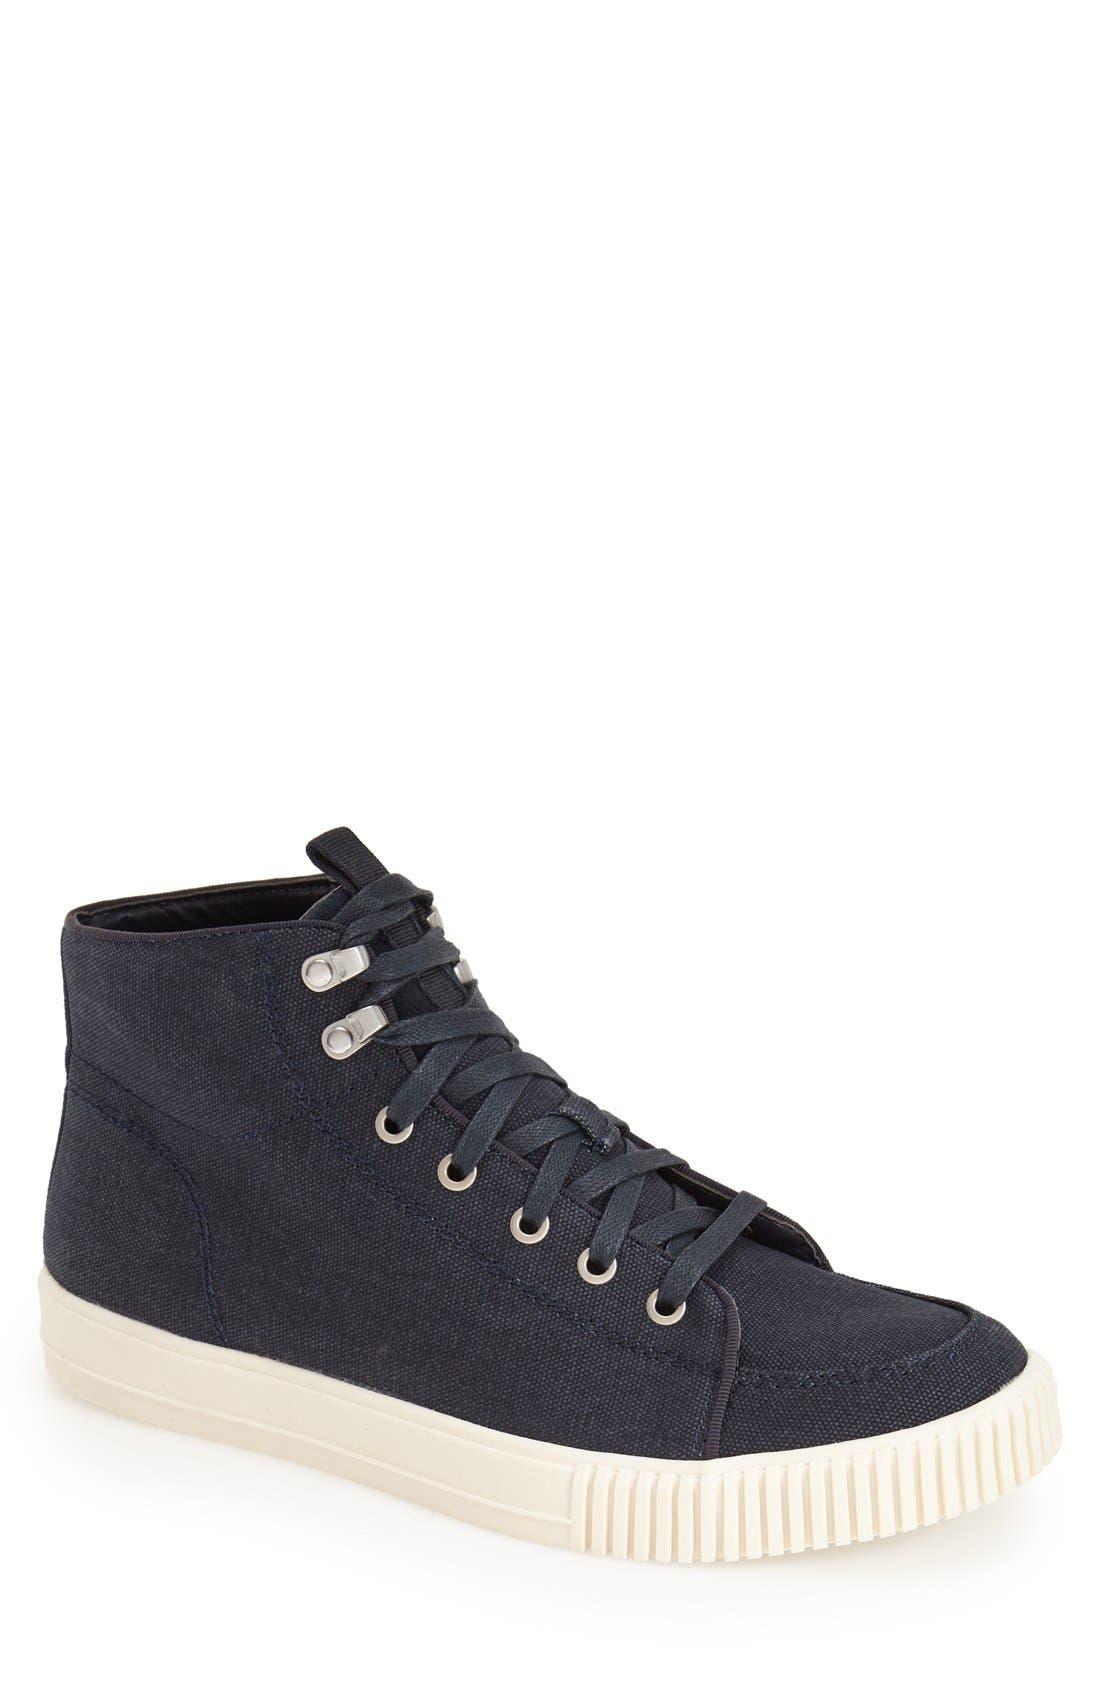 Main Image - Calvin Klein Jeans 'Jenson' Sneaker (Men)